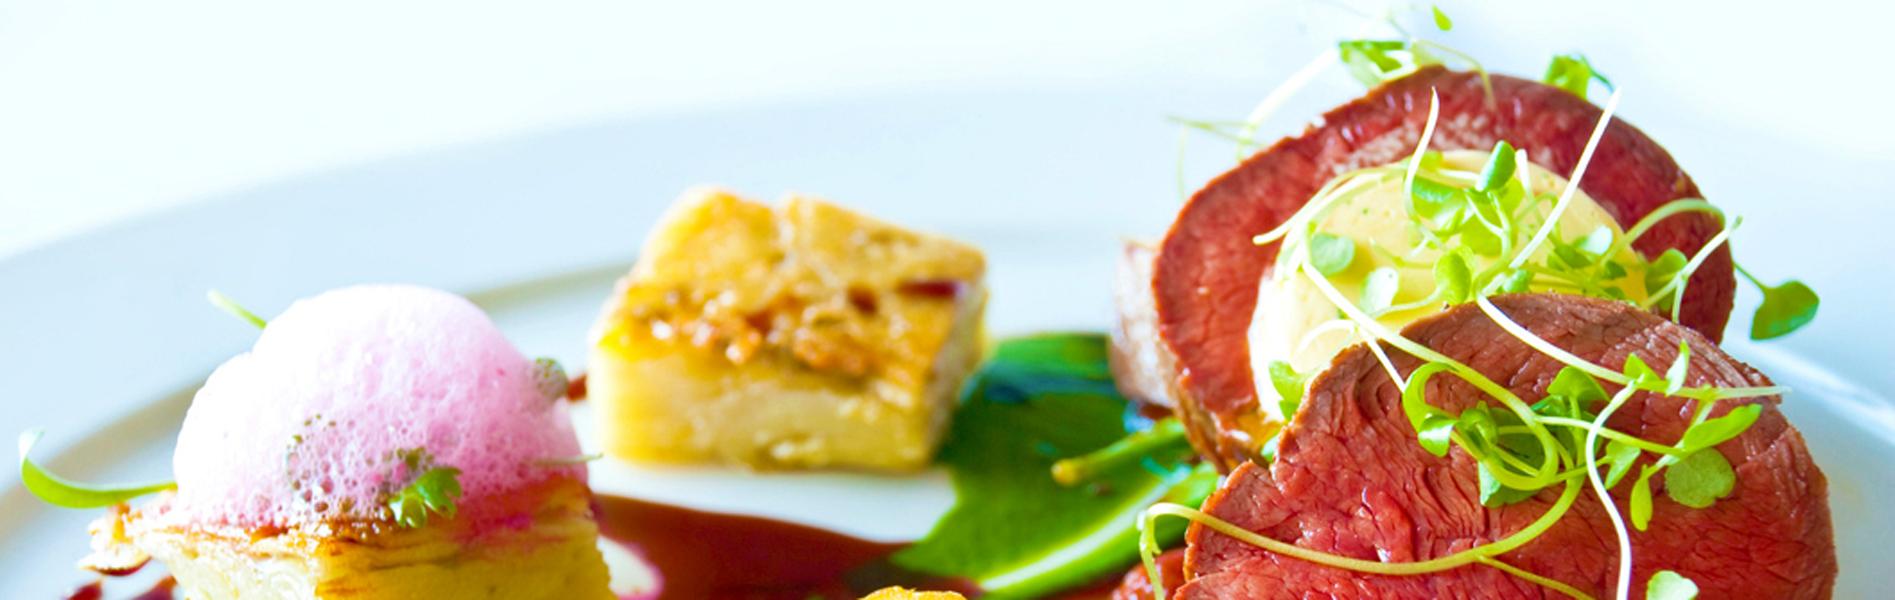 Unikorn Catering - Menüs